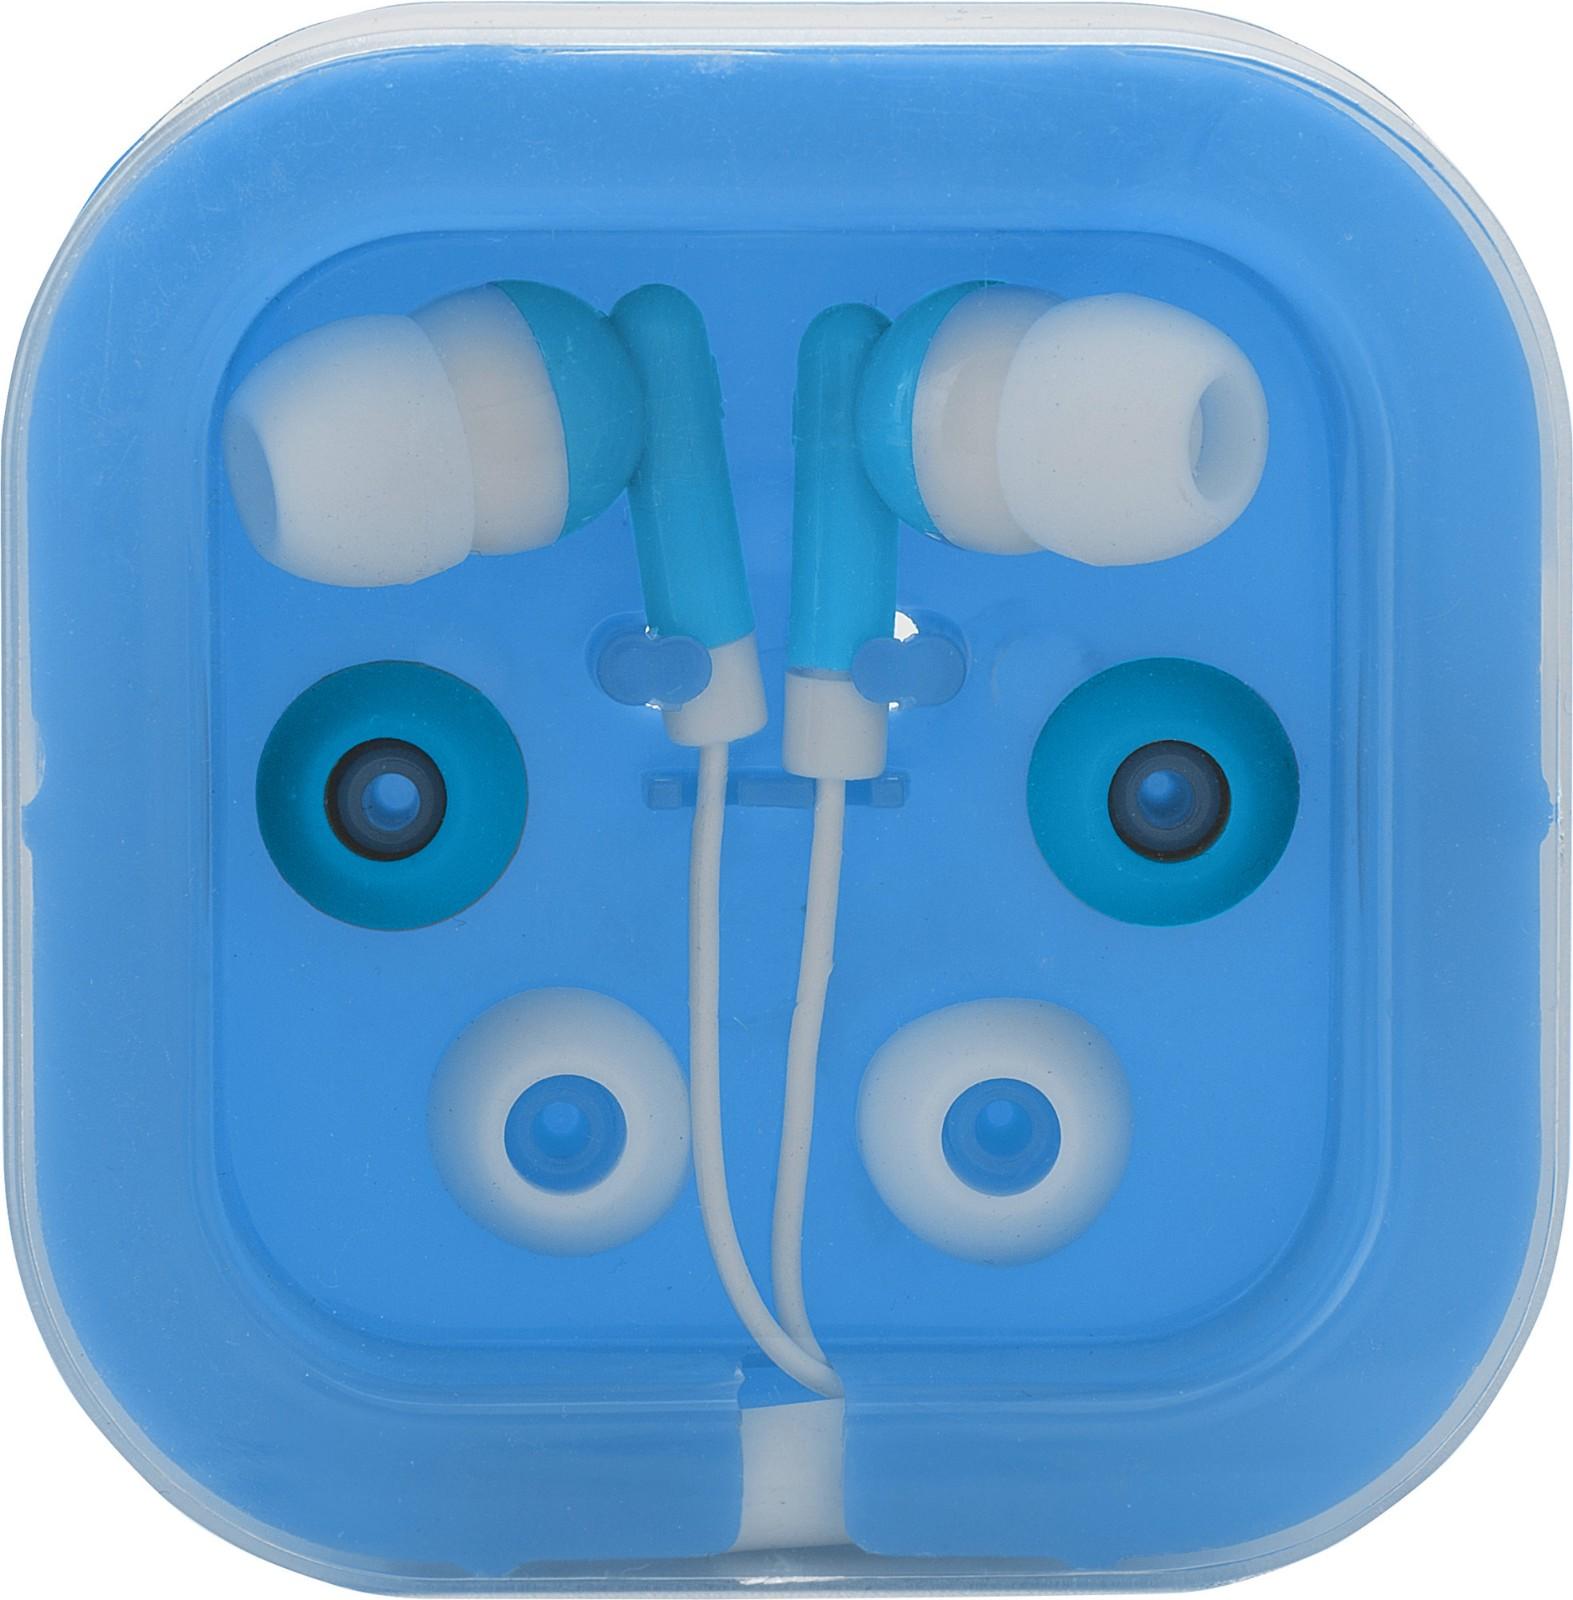 ABS earphones - Light Blue